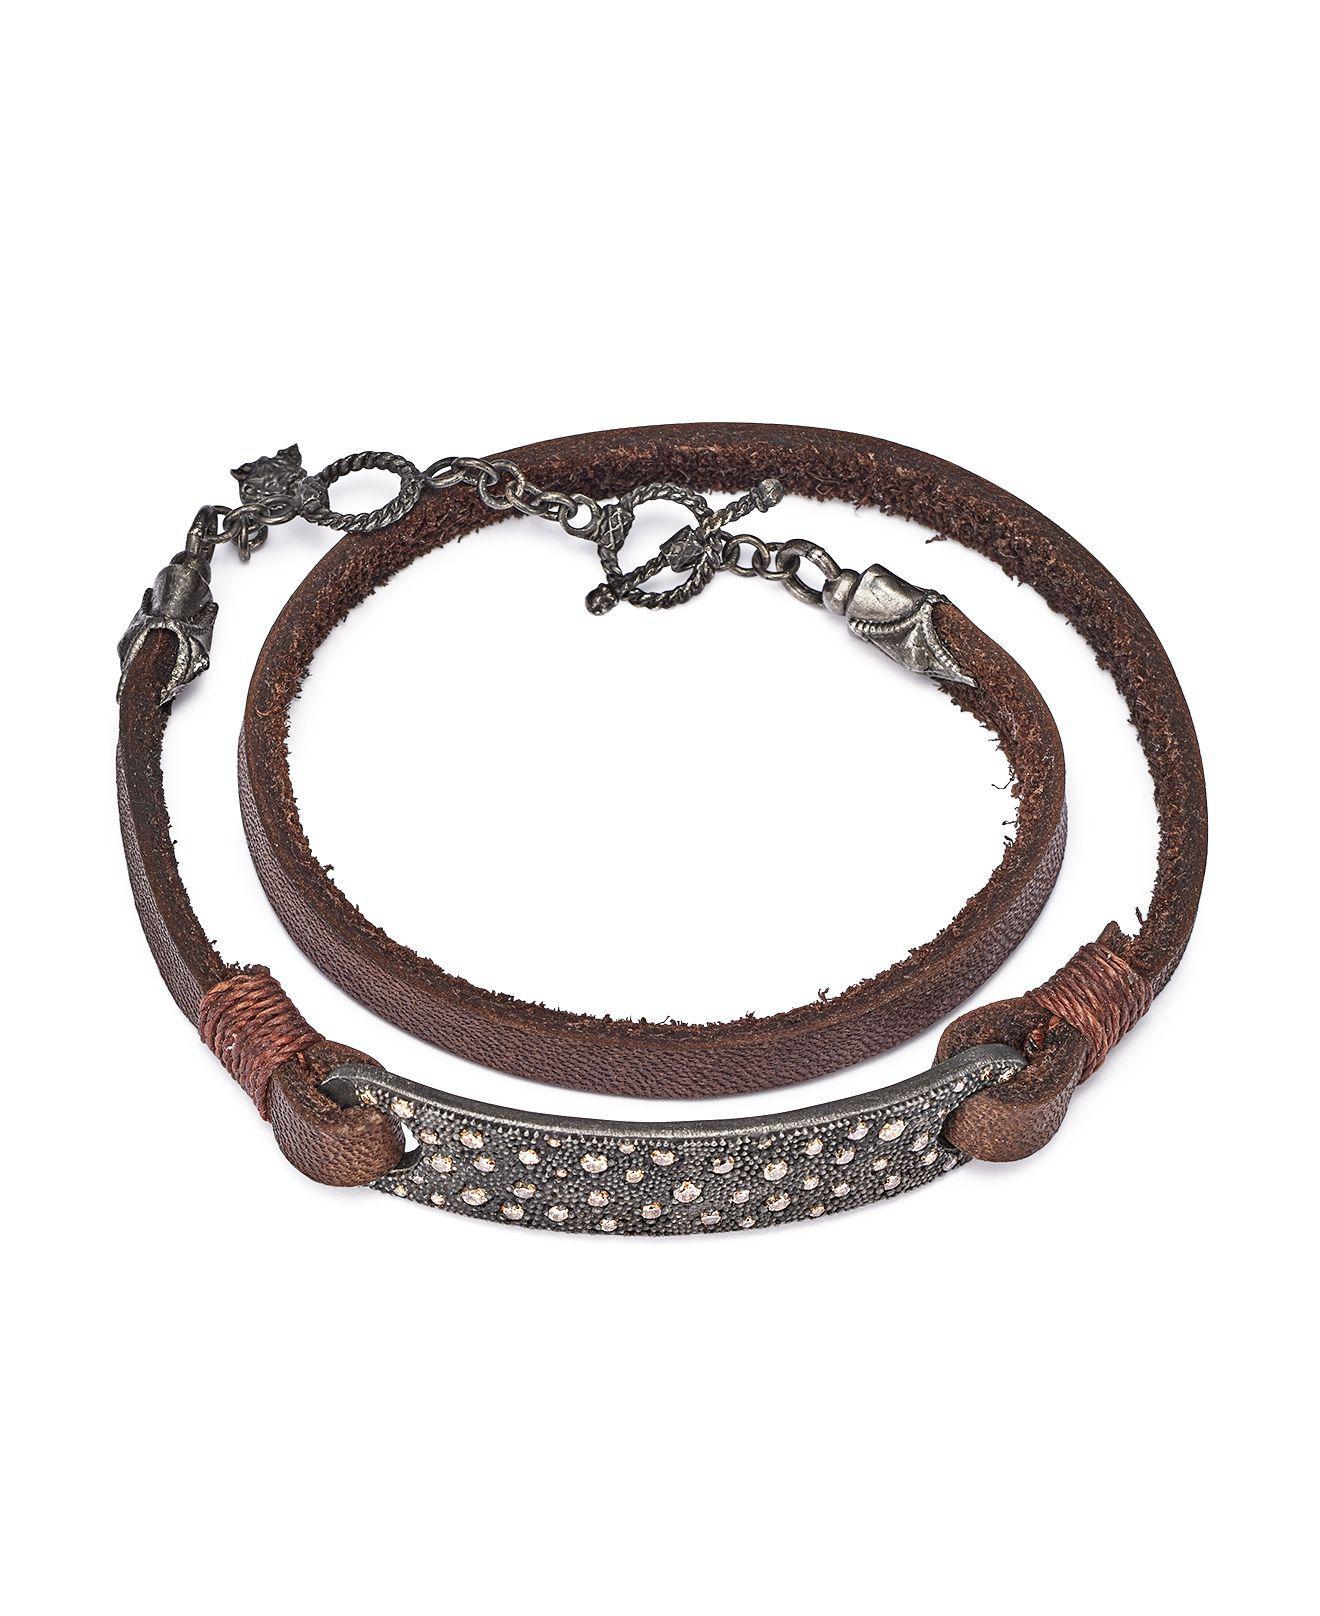 Armenta Old World Midnight Leather Wrap Bracelet c1NcCJKhOP